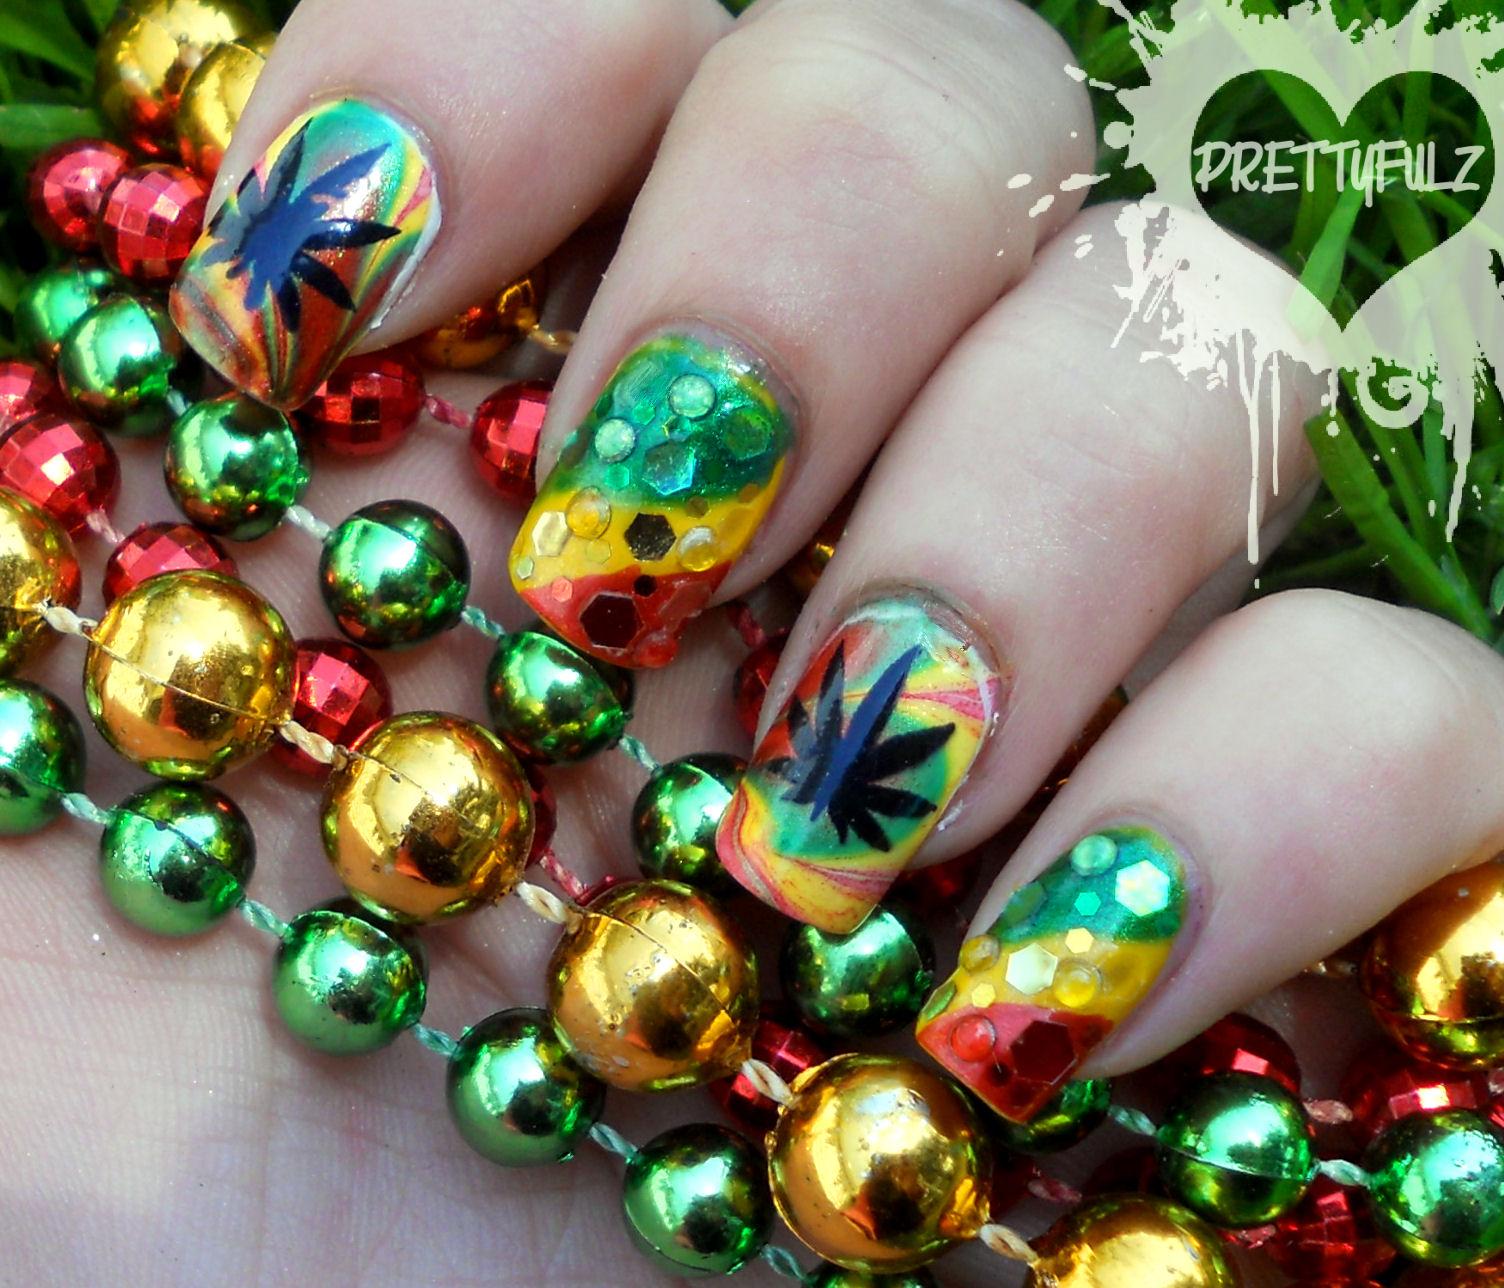 Prettyfulz: Rasta Deco Nail Art Design